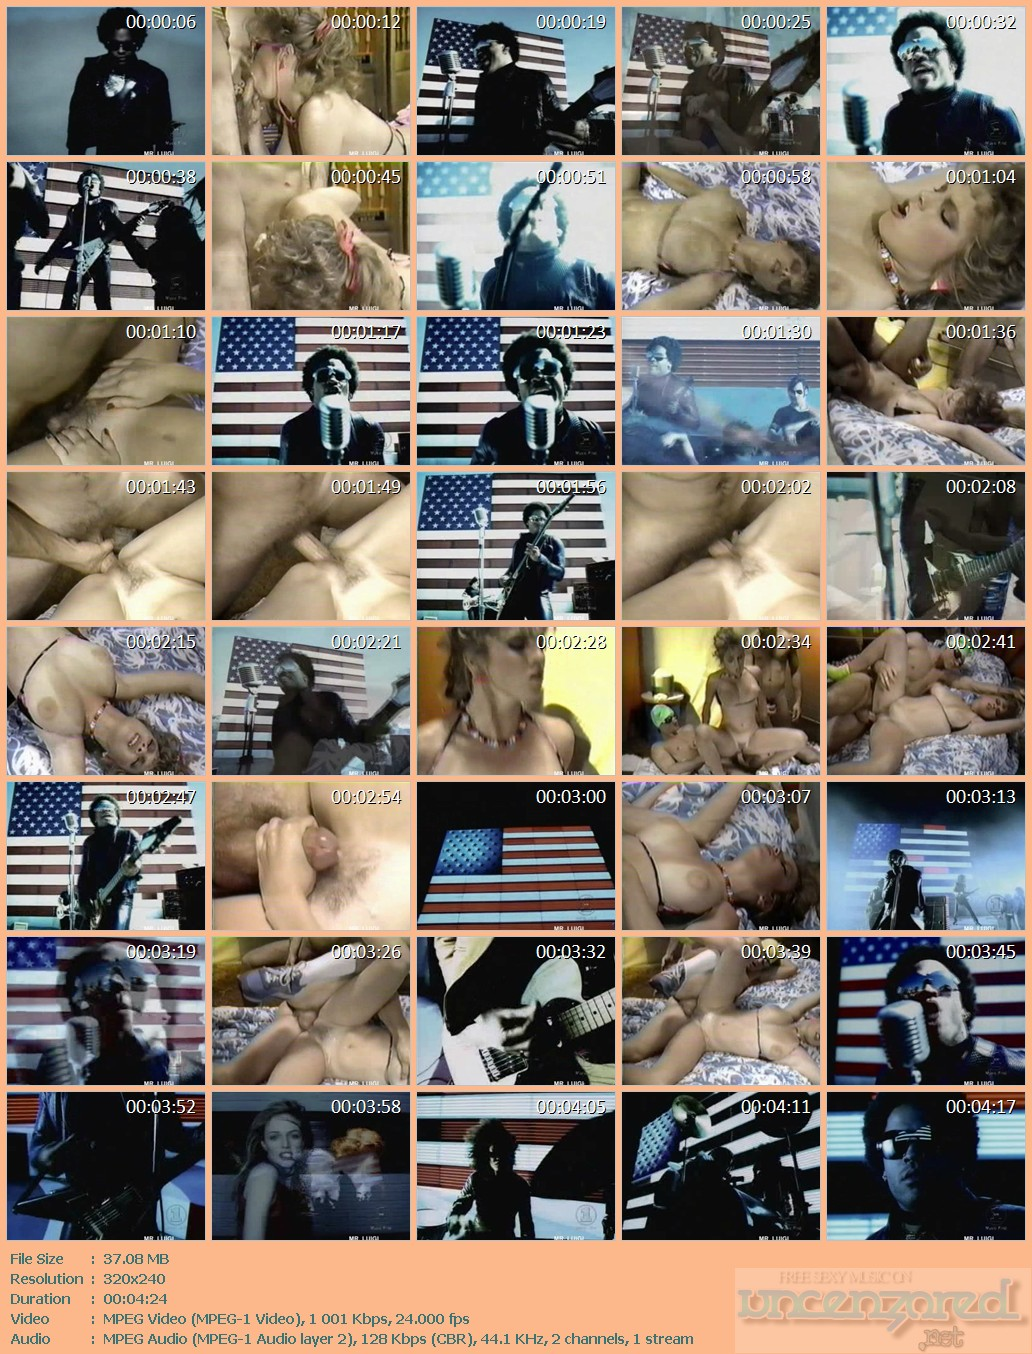 http://1.bp.blogspot.com/_V8lKt5jmtVY/TSmpK6TLB-I/AAAAAAAACHo/_vIJ4Ccvpl8/s1600/Lenny+Kravitz+%2526+Traci+Lords+-+American+Woman%2528XXX+Version%2529.mpg.jpg